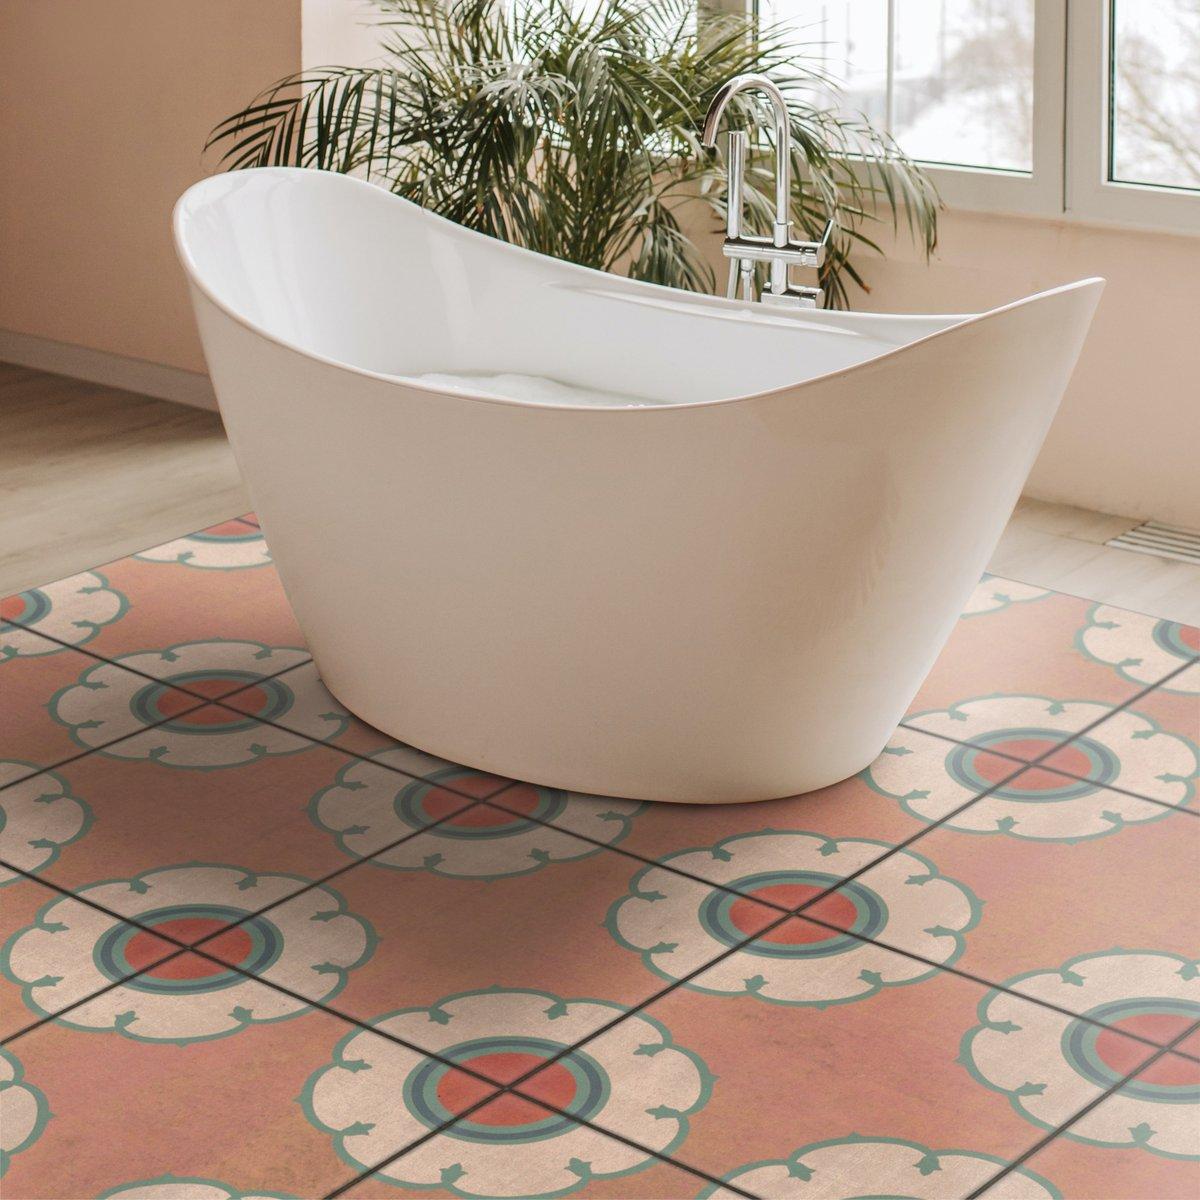 Stylishly Clean Bathroom Decor Ideas